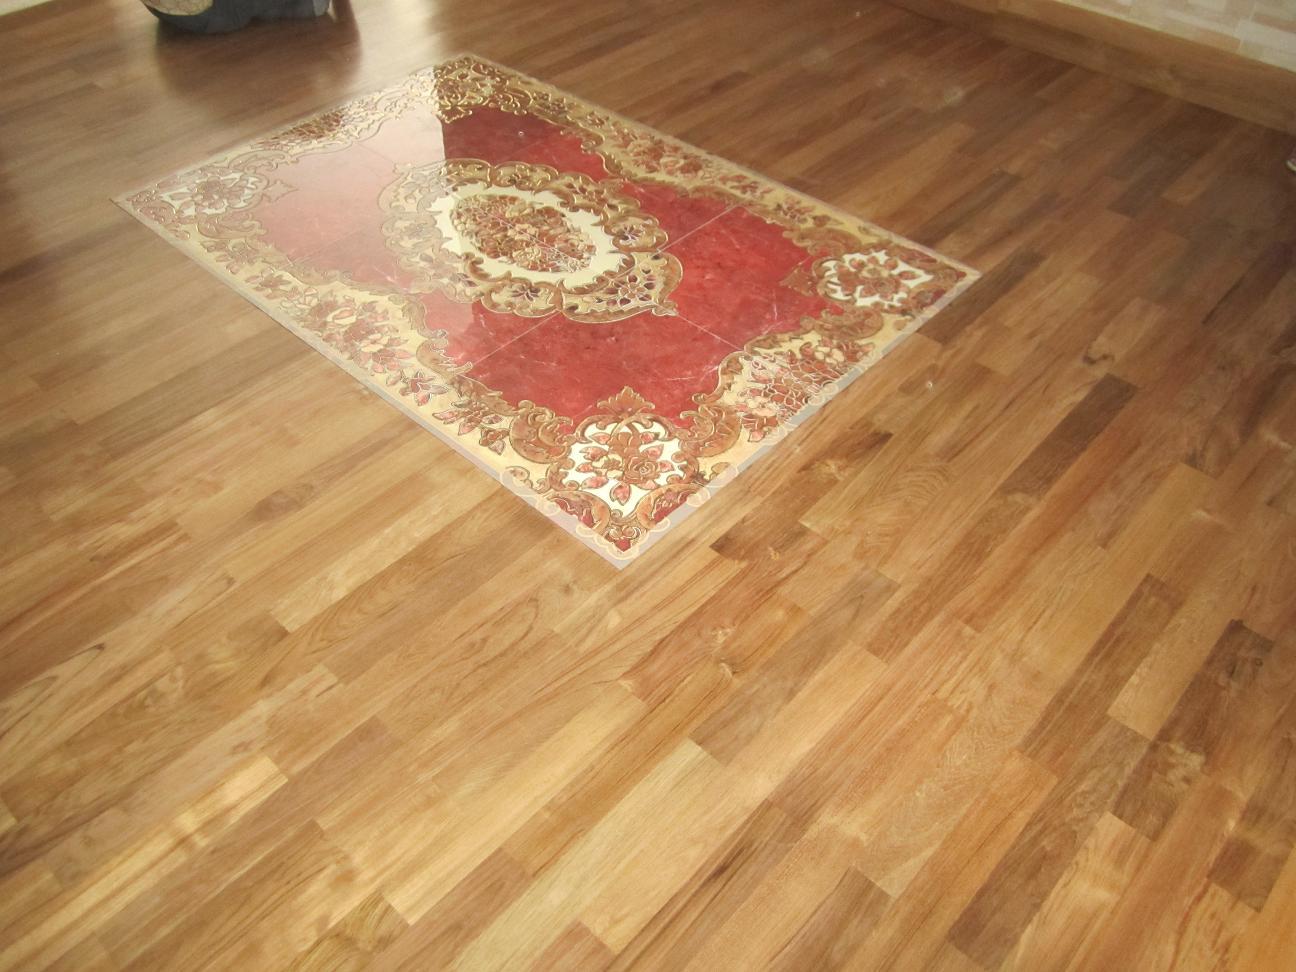 Wooden floor tiles clickbd wooden floor tiles doublecrazyfo Choice Image